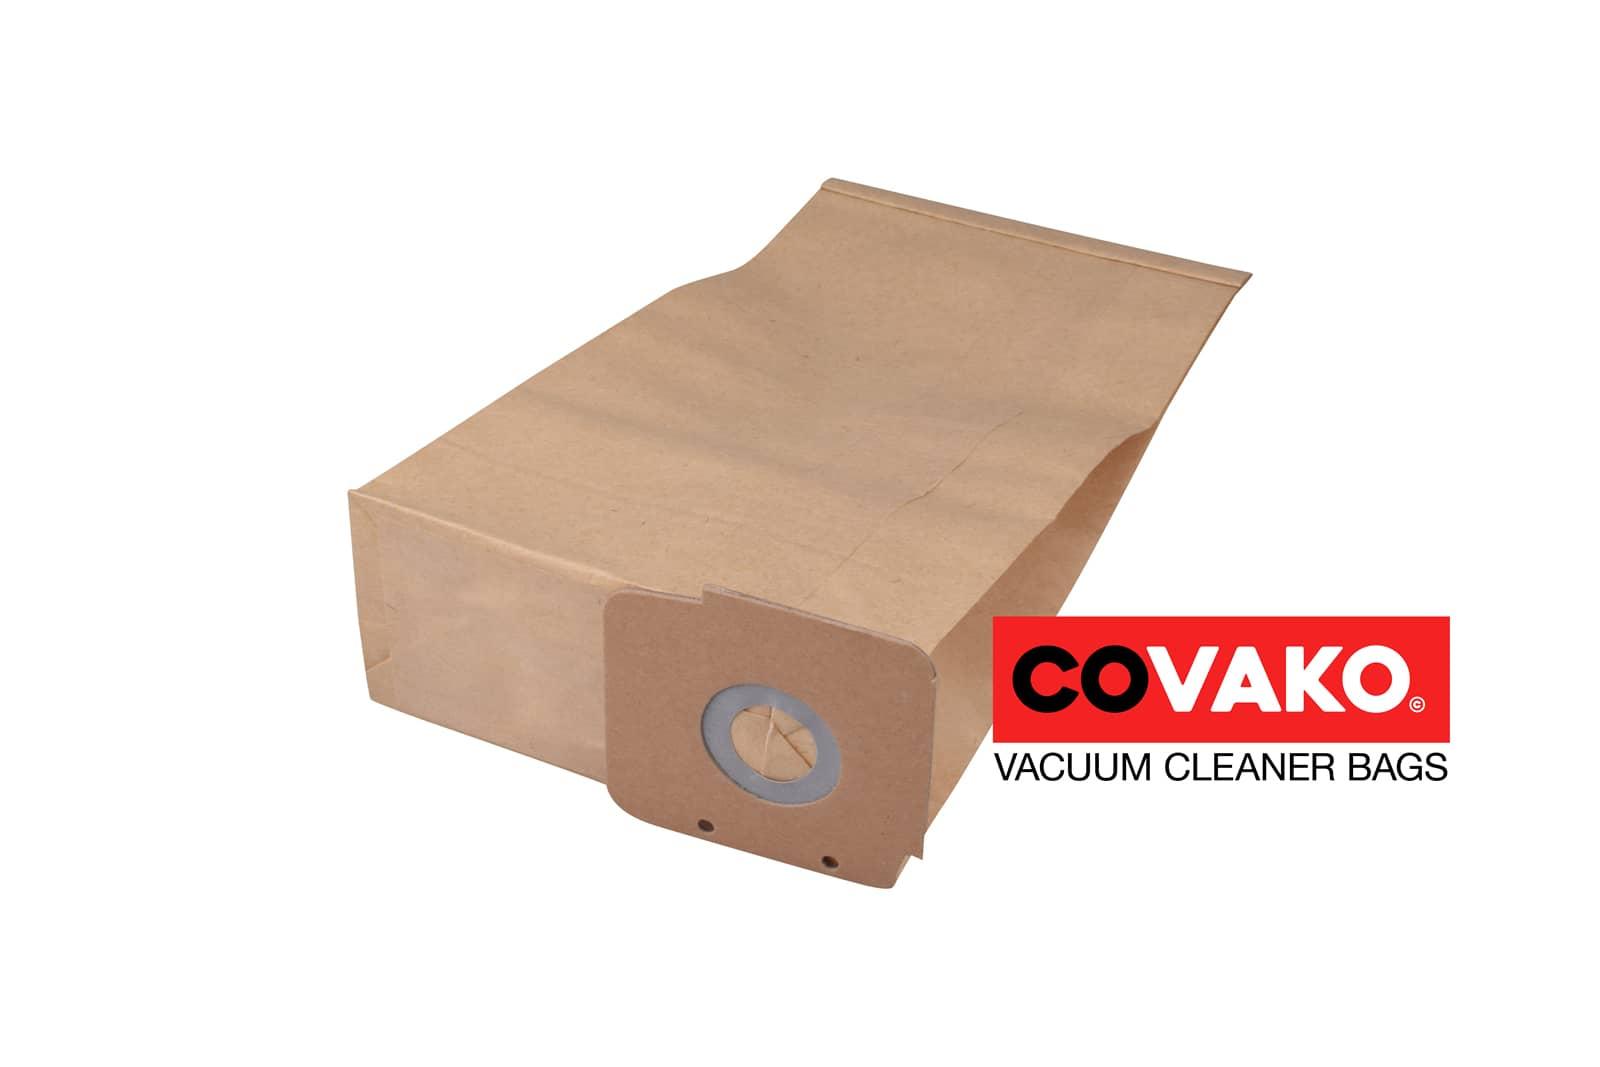 Kärcher CV 30/1 / Papier - Kärcher stofzuigerzakken